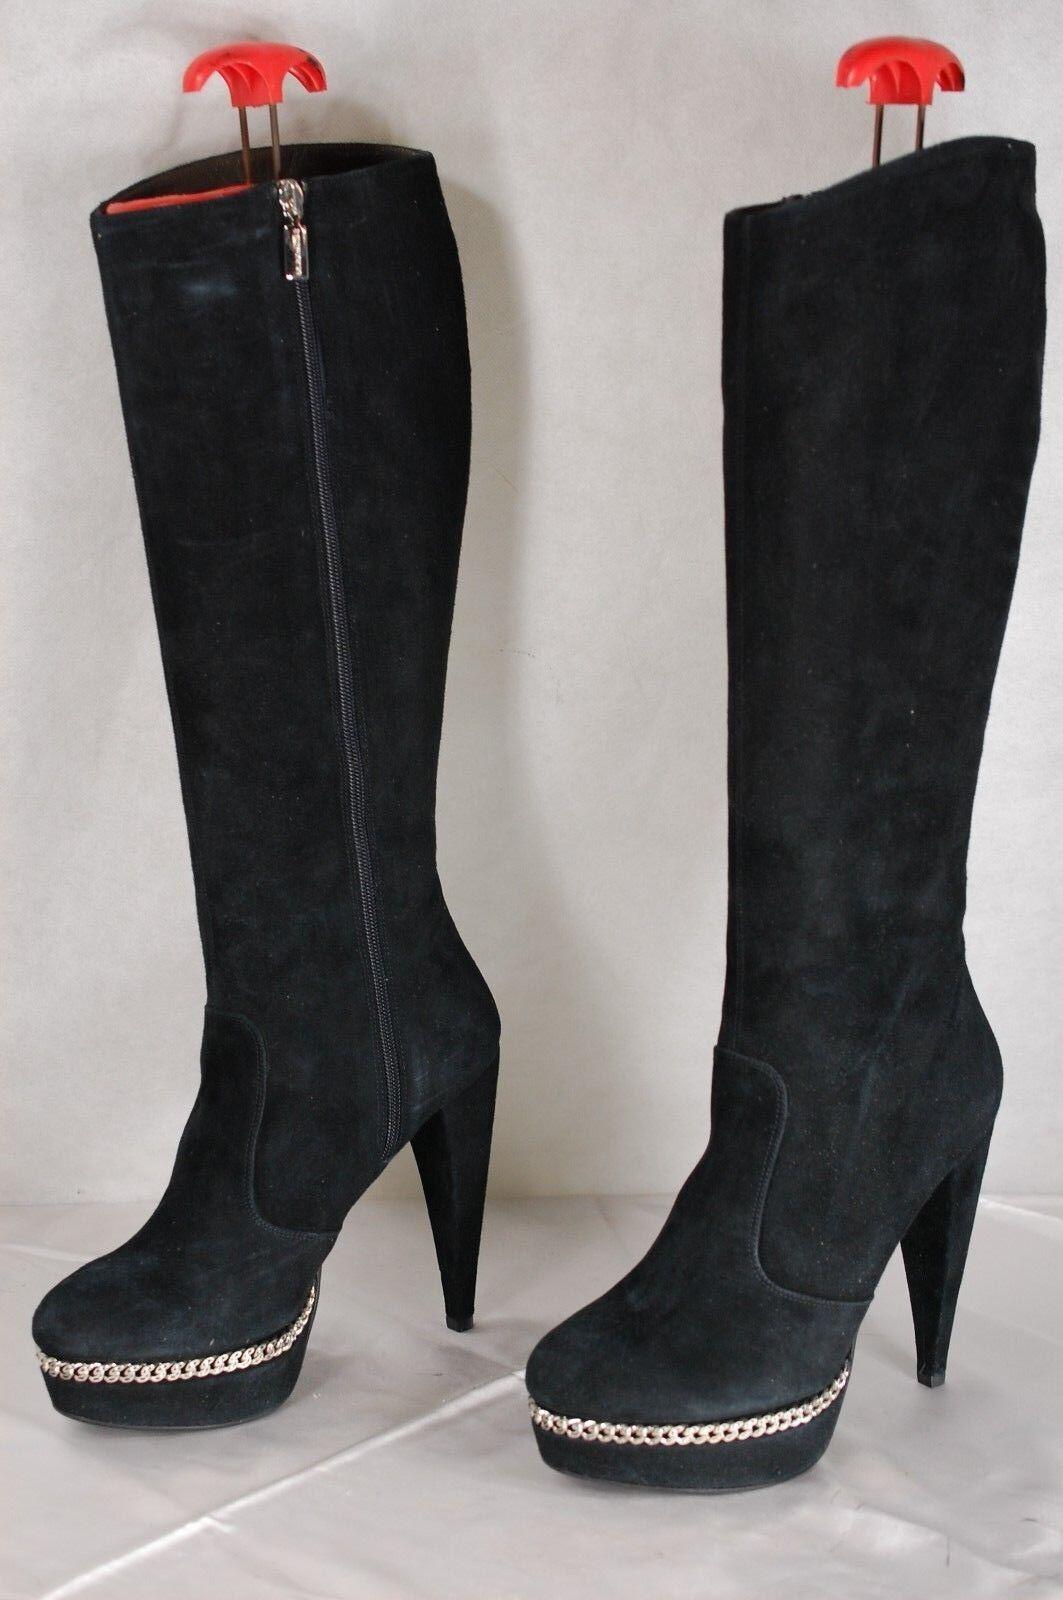 SUPER SEXY BRUNO MAGLI  WOMEN HI HEEL BLACK SUEDE & CHAIN  BOOTS US 10